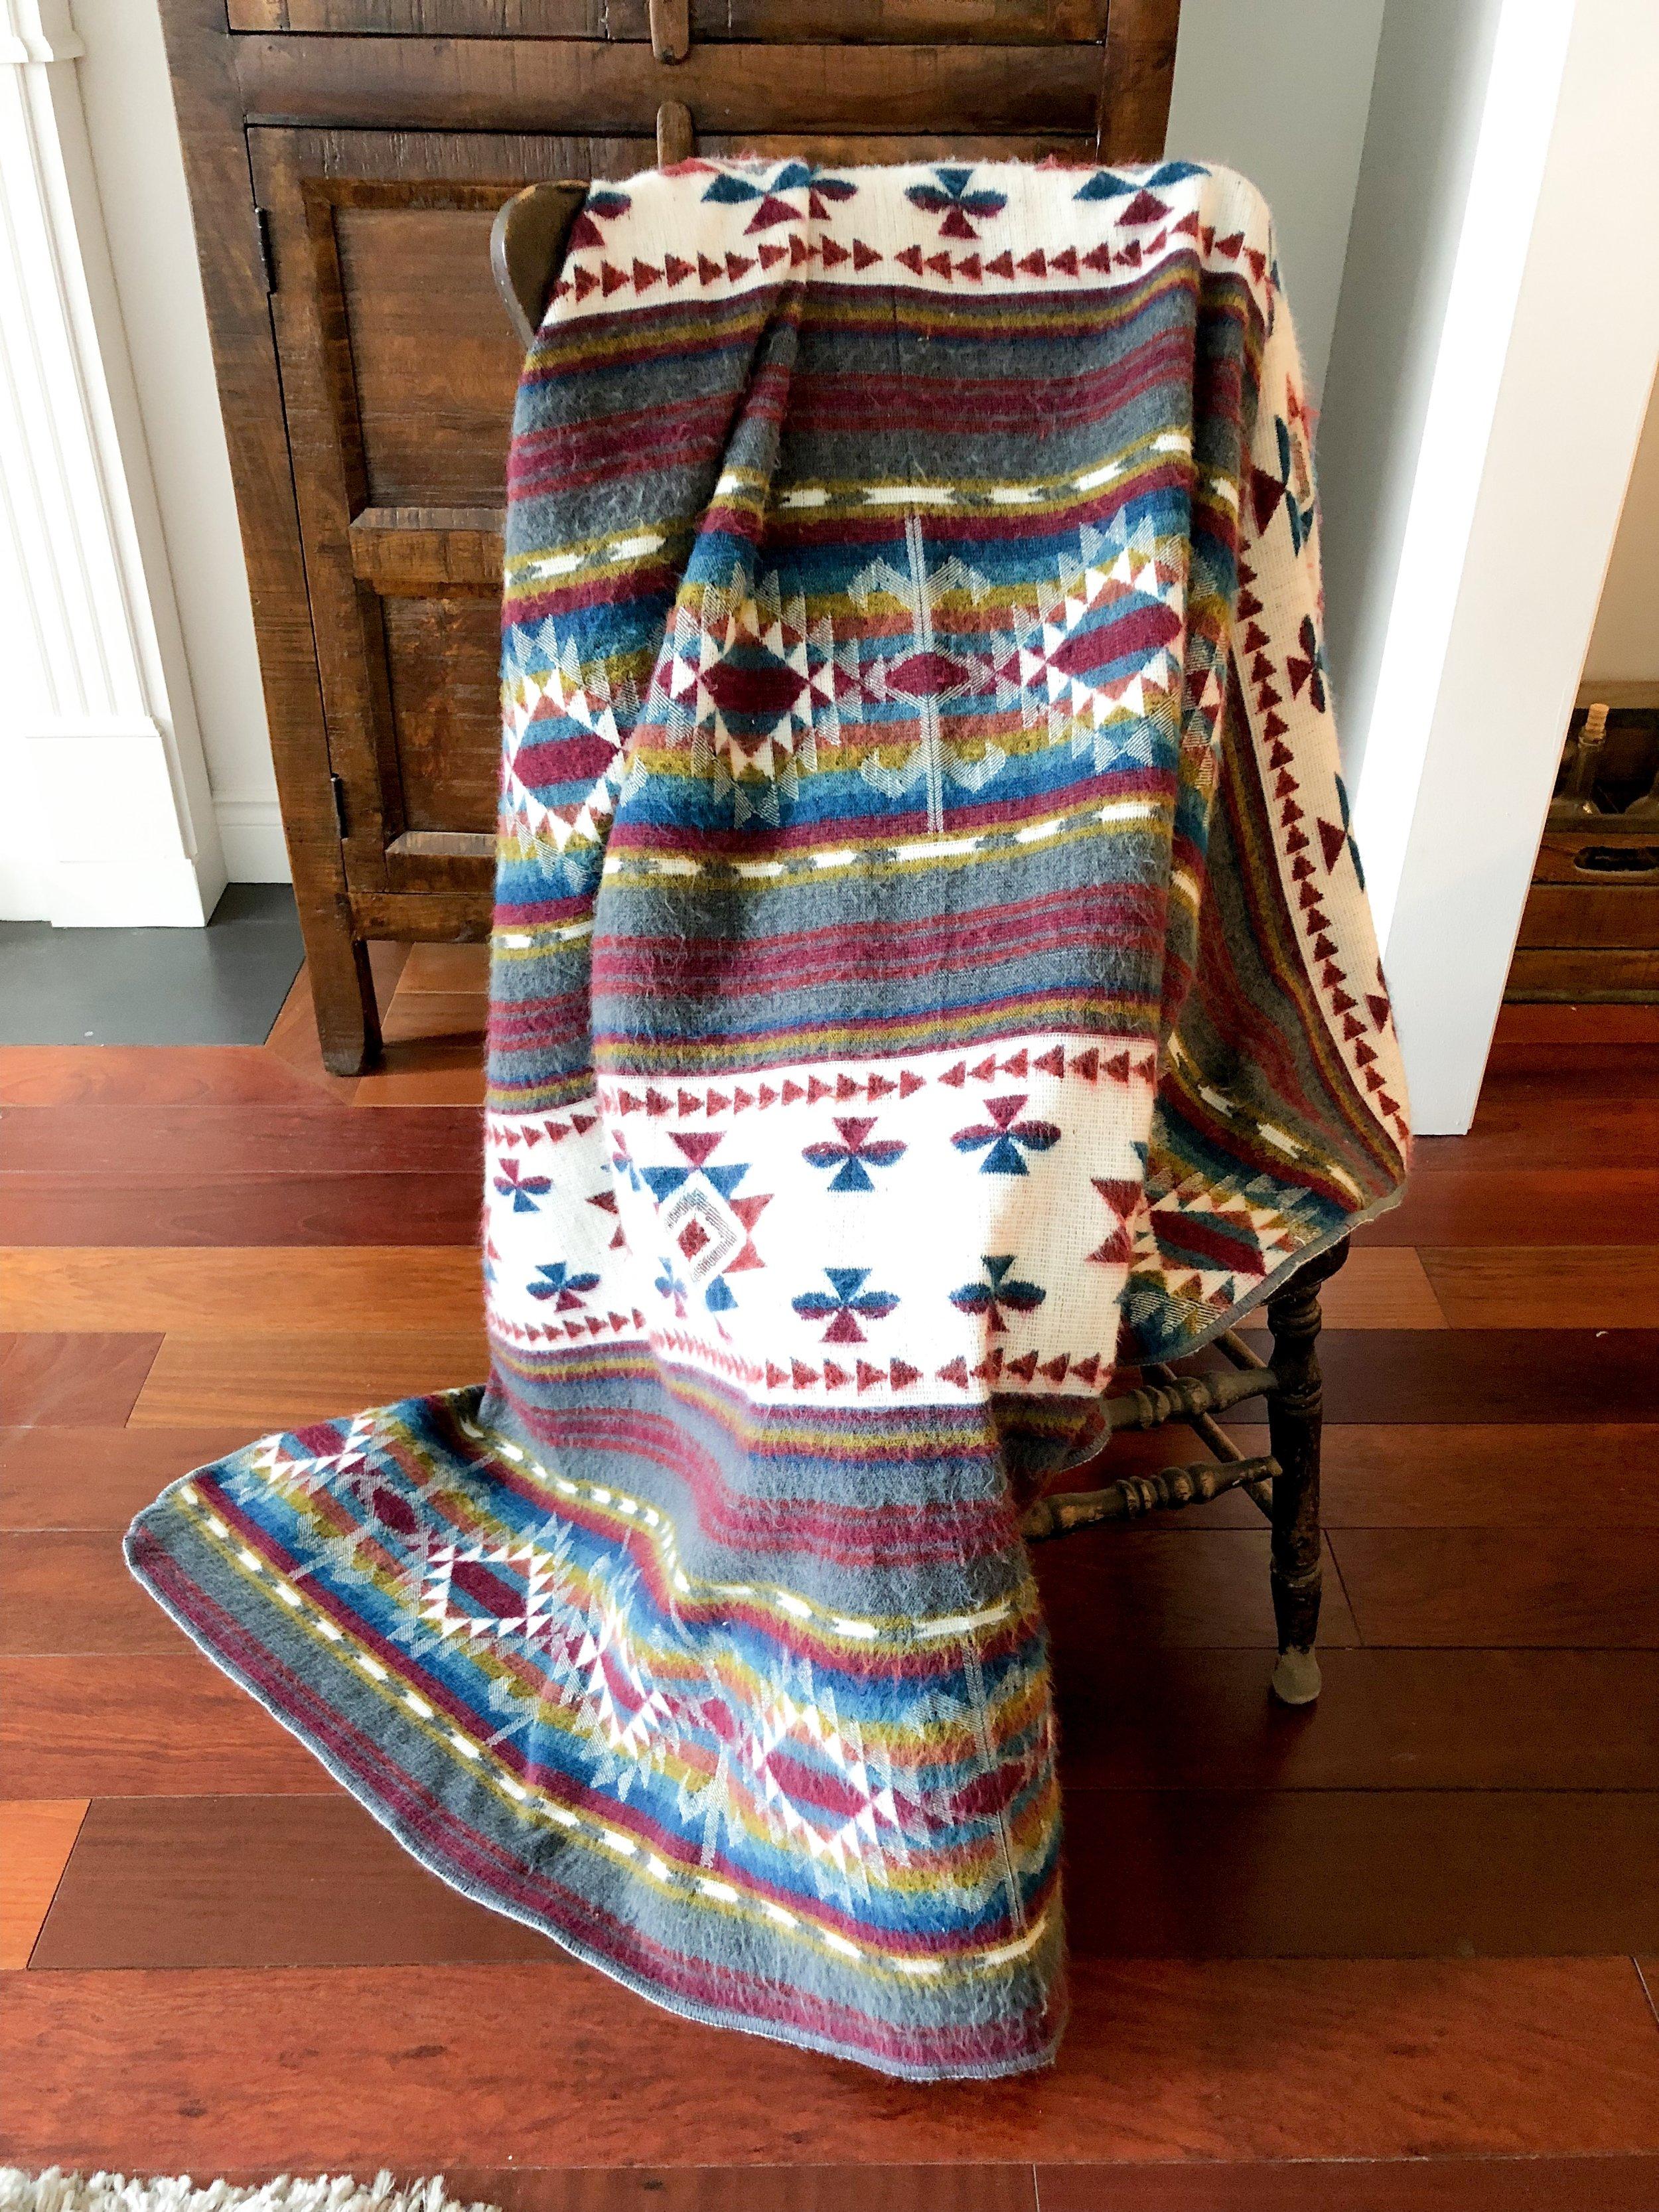 Quito Blanket / #035 / $20